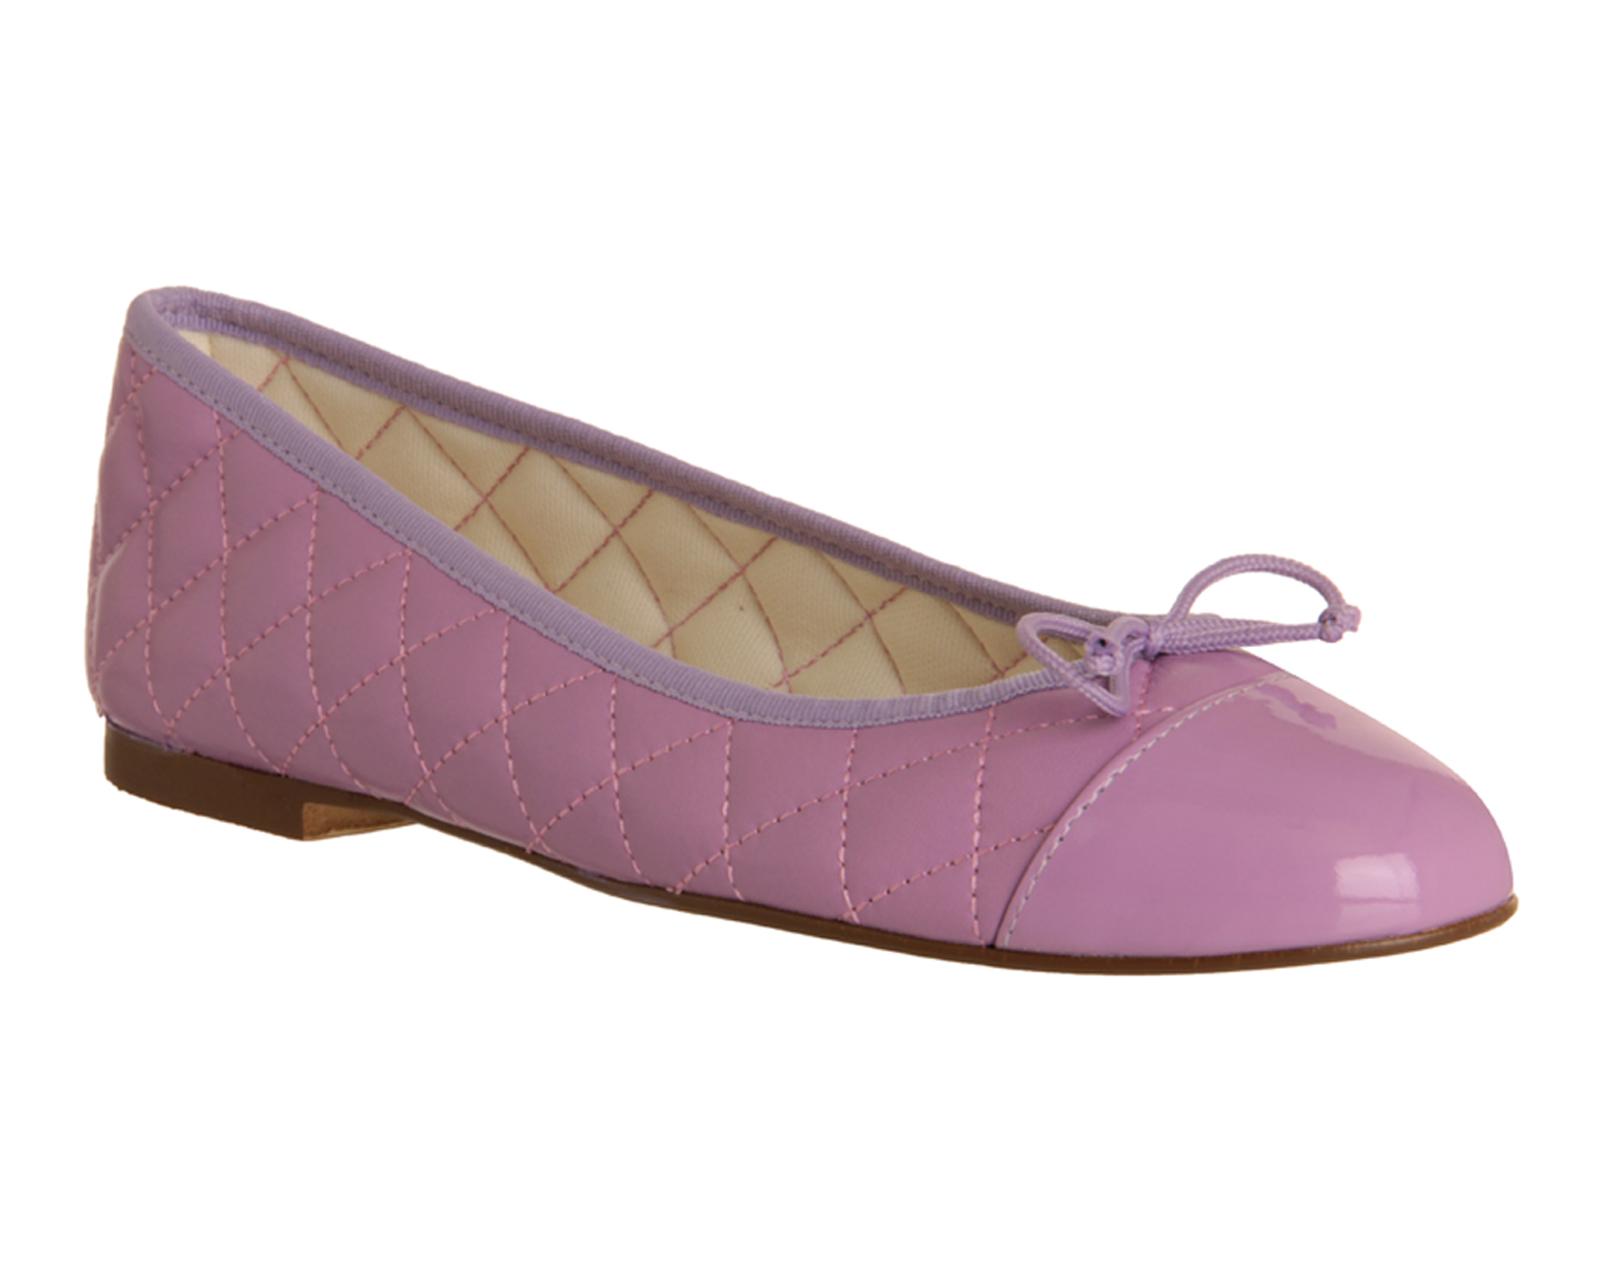 Womens-Office-Cecilia-Toe-cap-Ballerina-LILAC-LEATHER-Flats